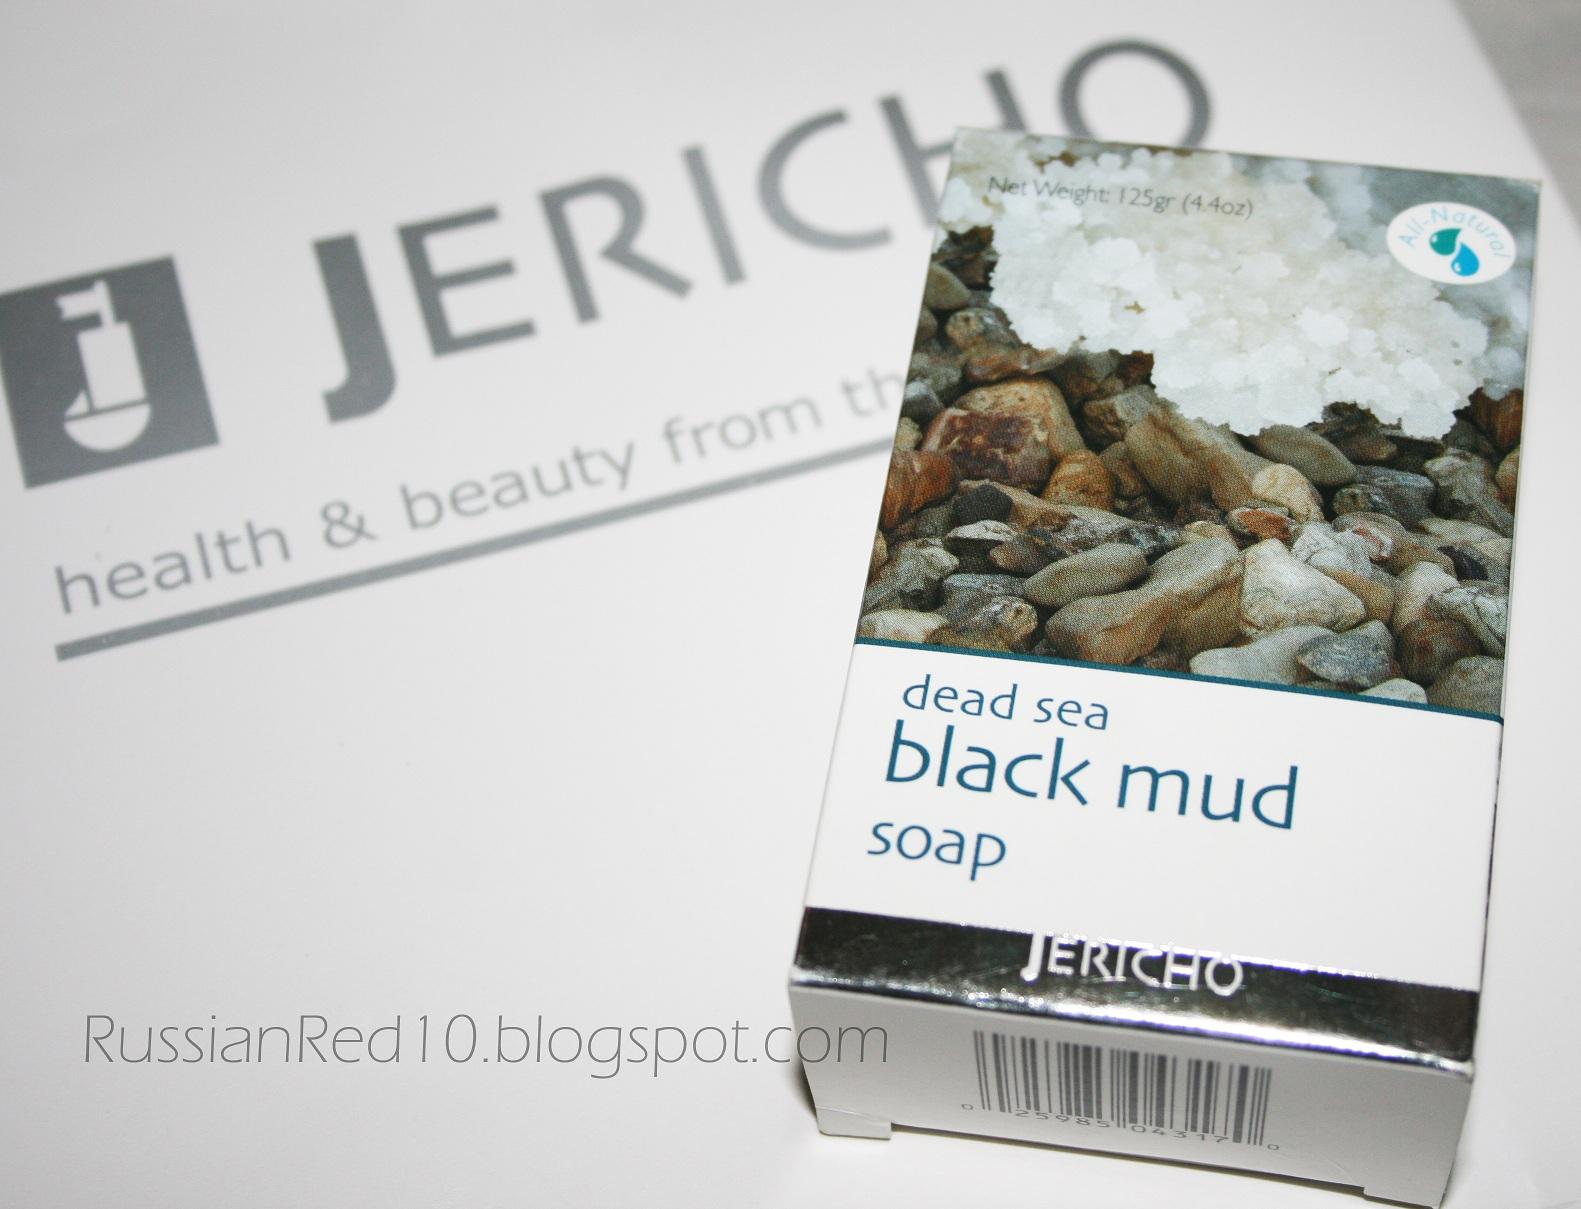 dead mineral cleanser facial sea jericho